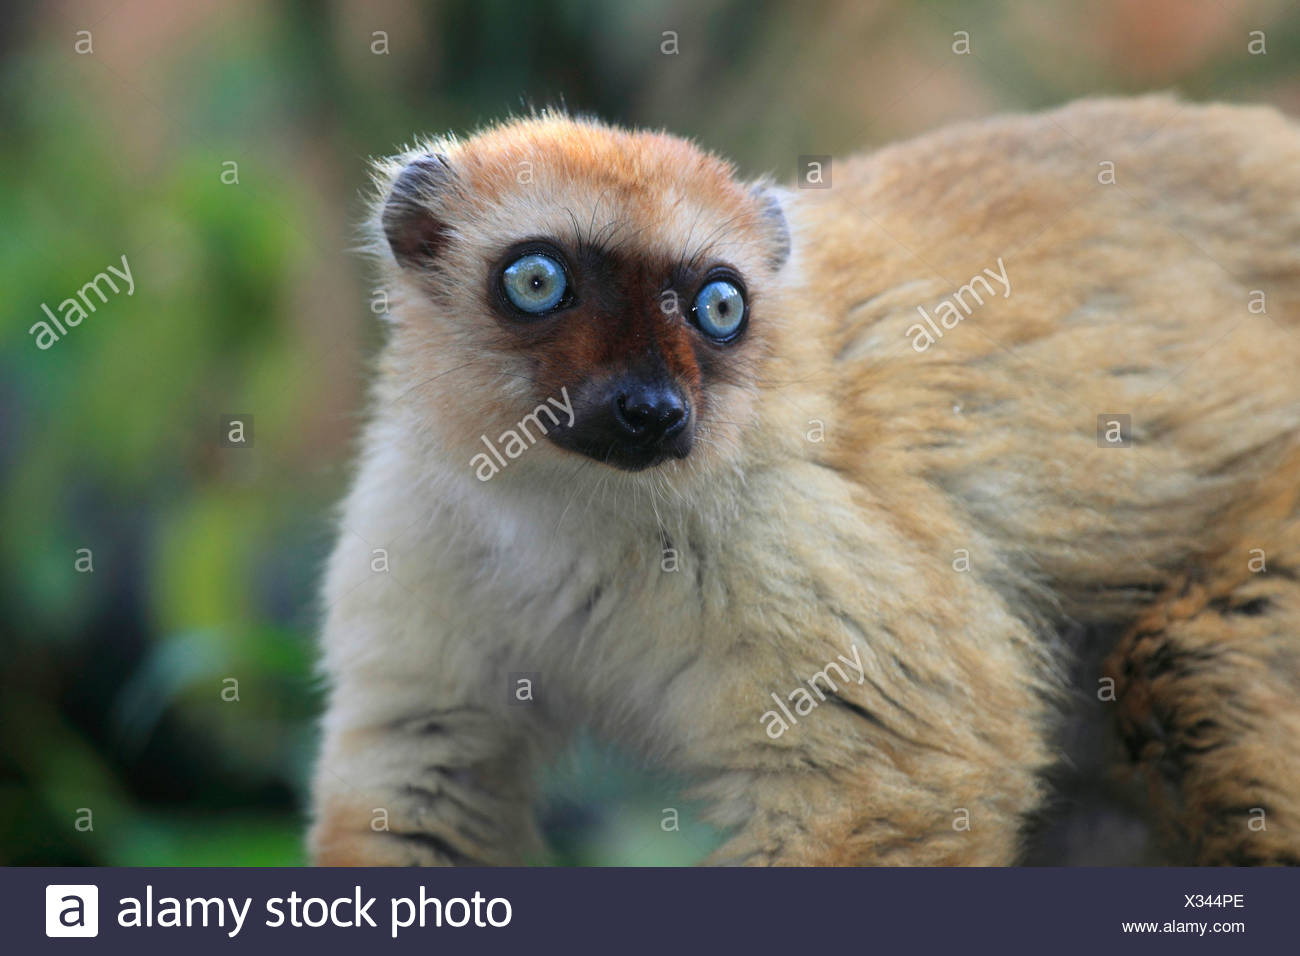 Sclater's Maki, Blue-eyed Lemur (Eulemur flavifrons, Eulemur macaco flavifrons, Lemur macaco flavifrons), closeup - Stock Image